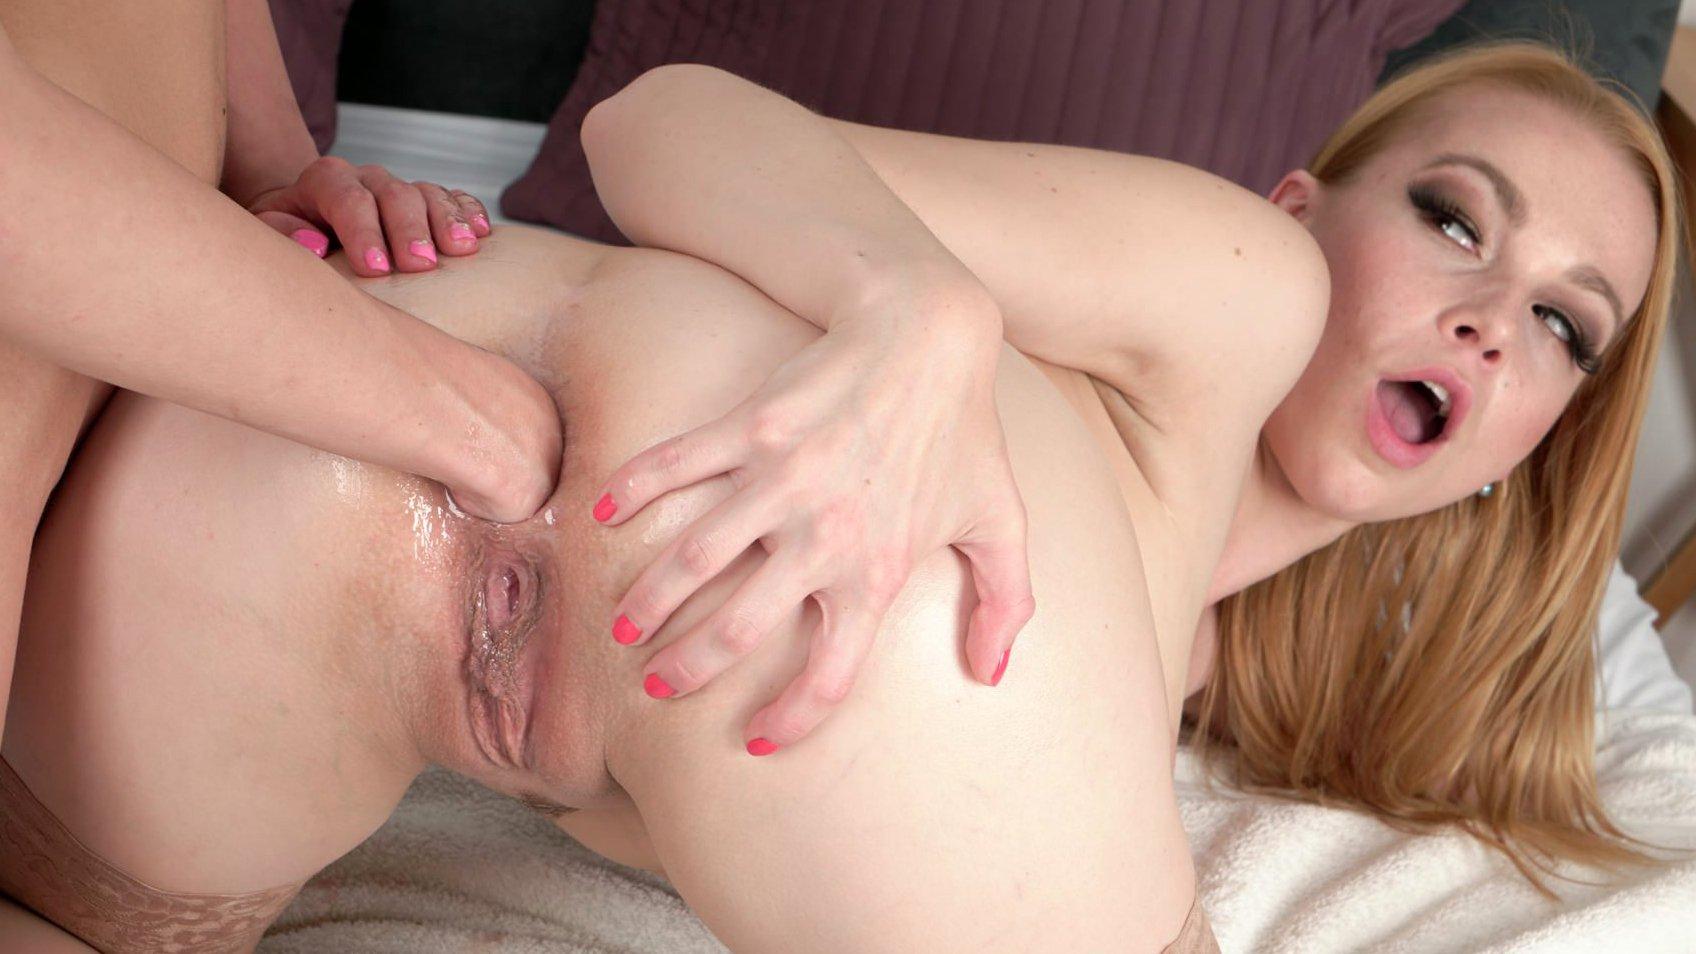 Amazing Anal amazing anal fisting lesbian porn